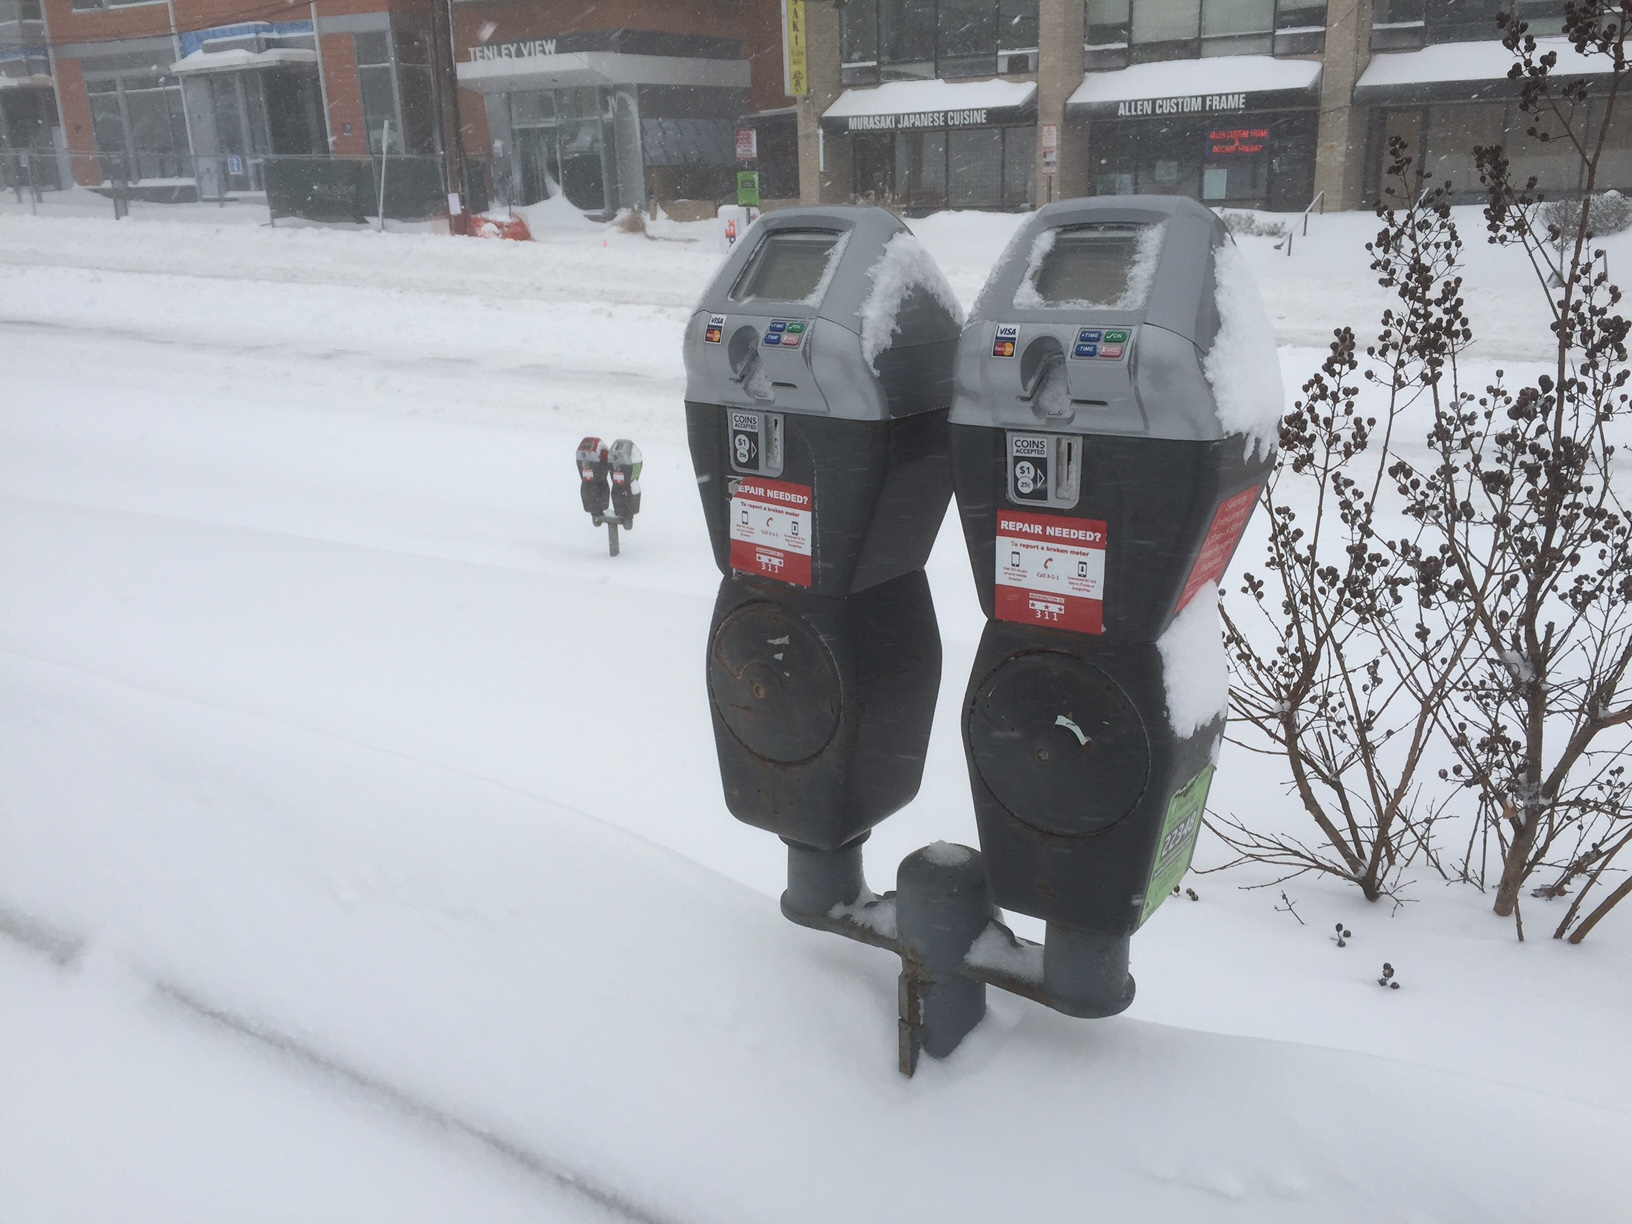 A parking meter is seen in D.C. (WTOP/Dave Dildine)